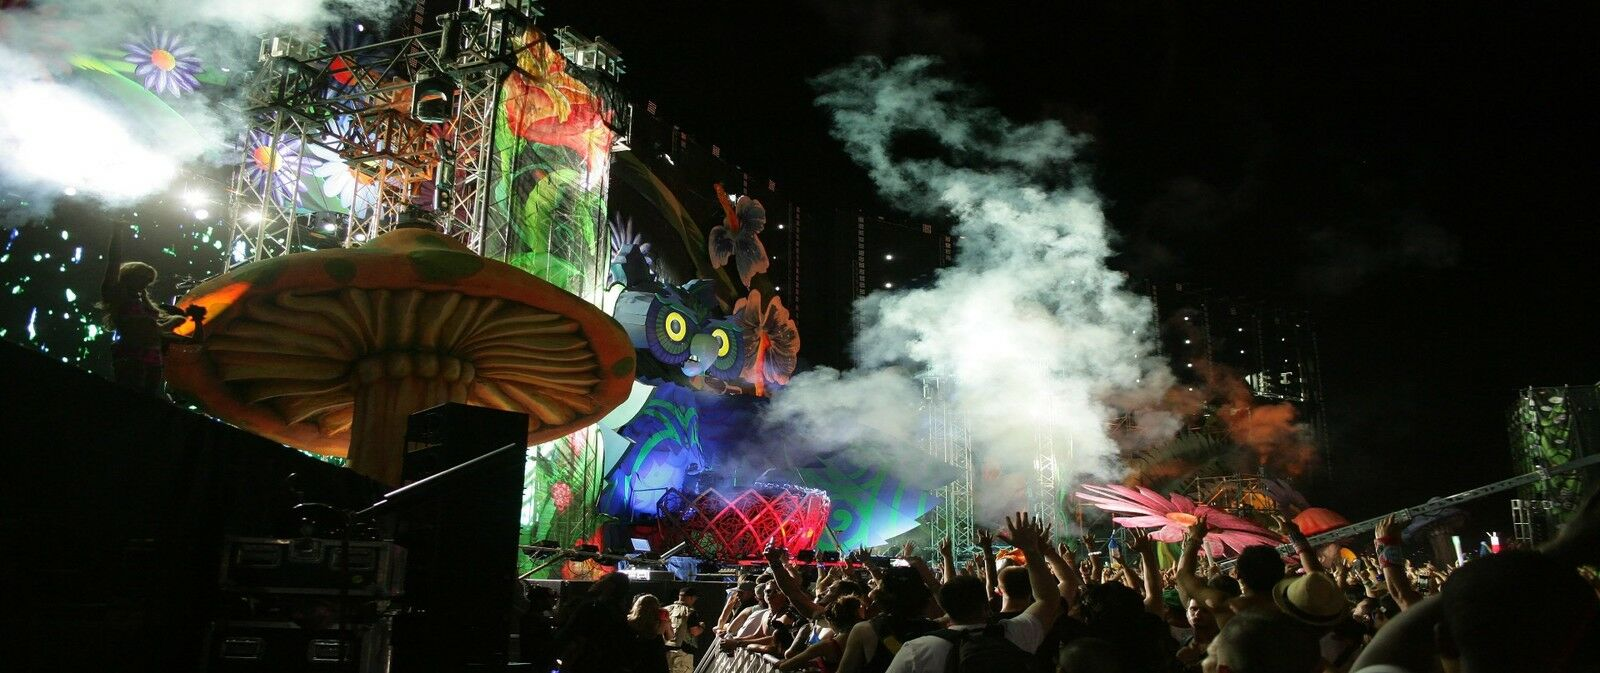 EDC Electric Daisy Carnival